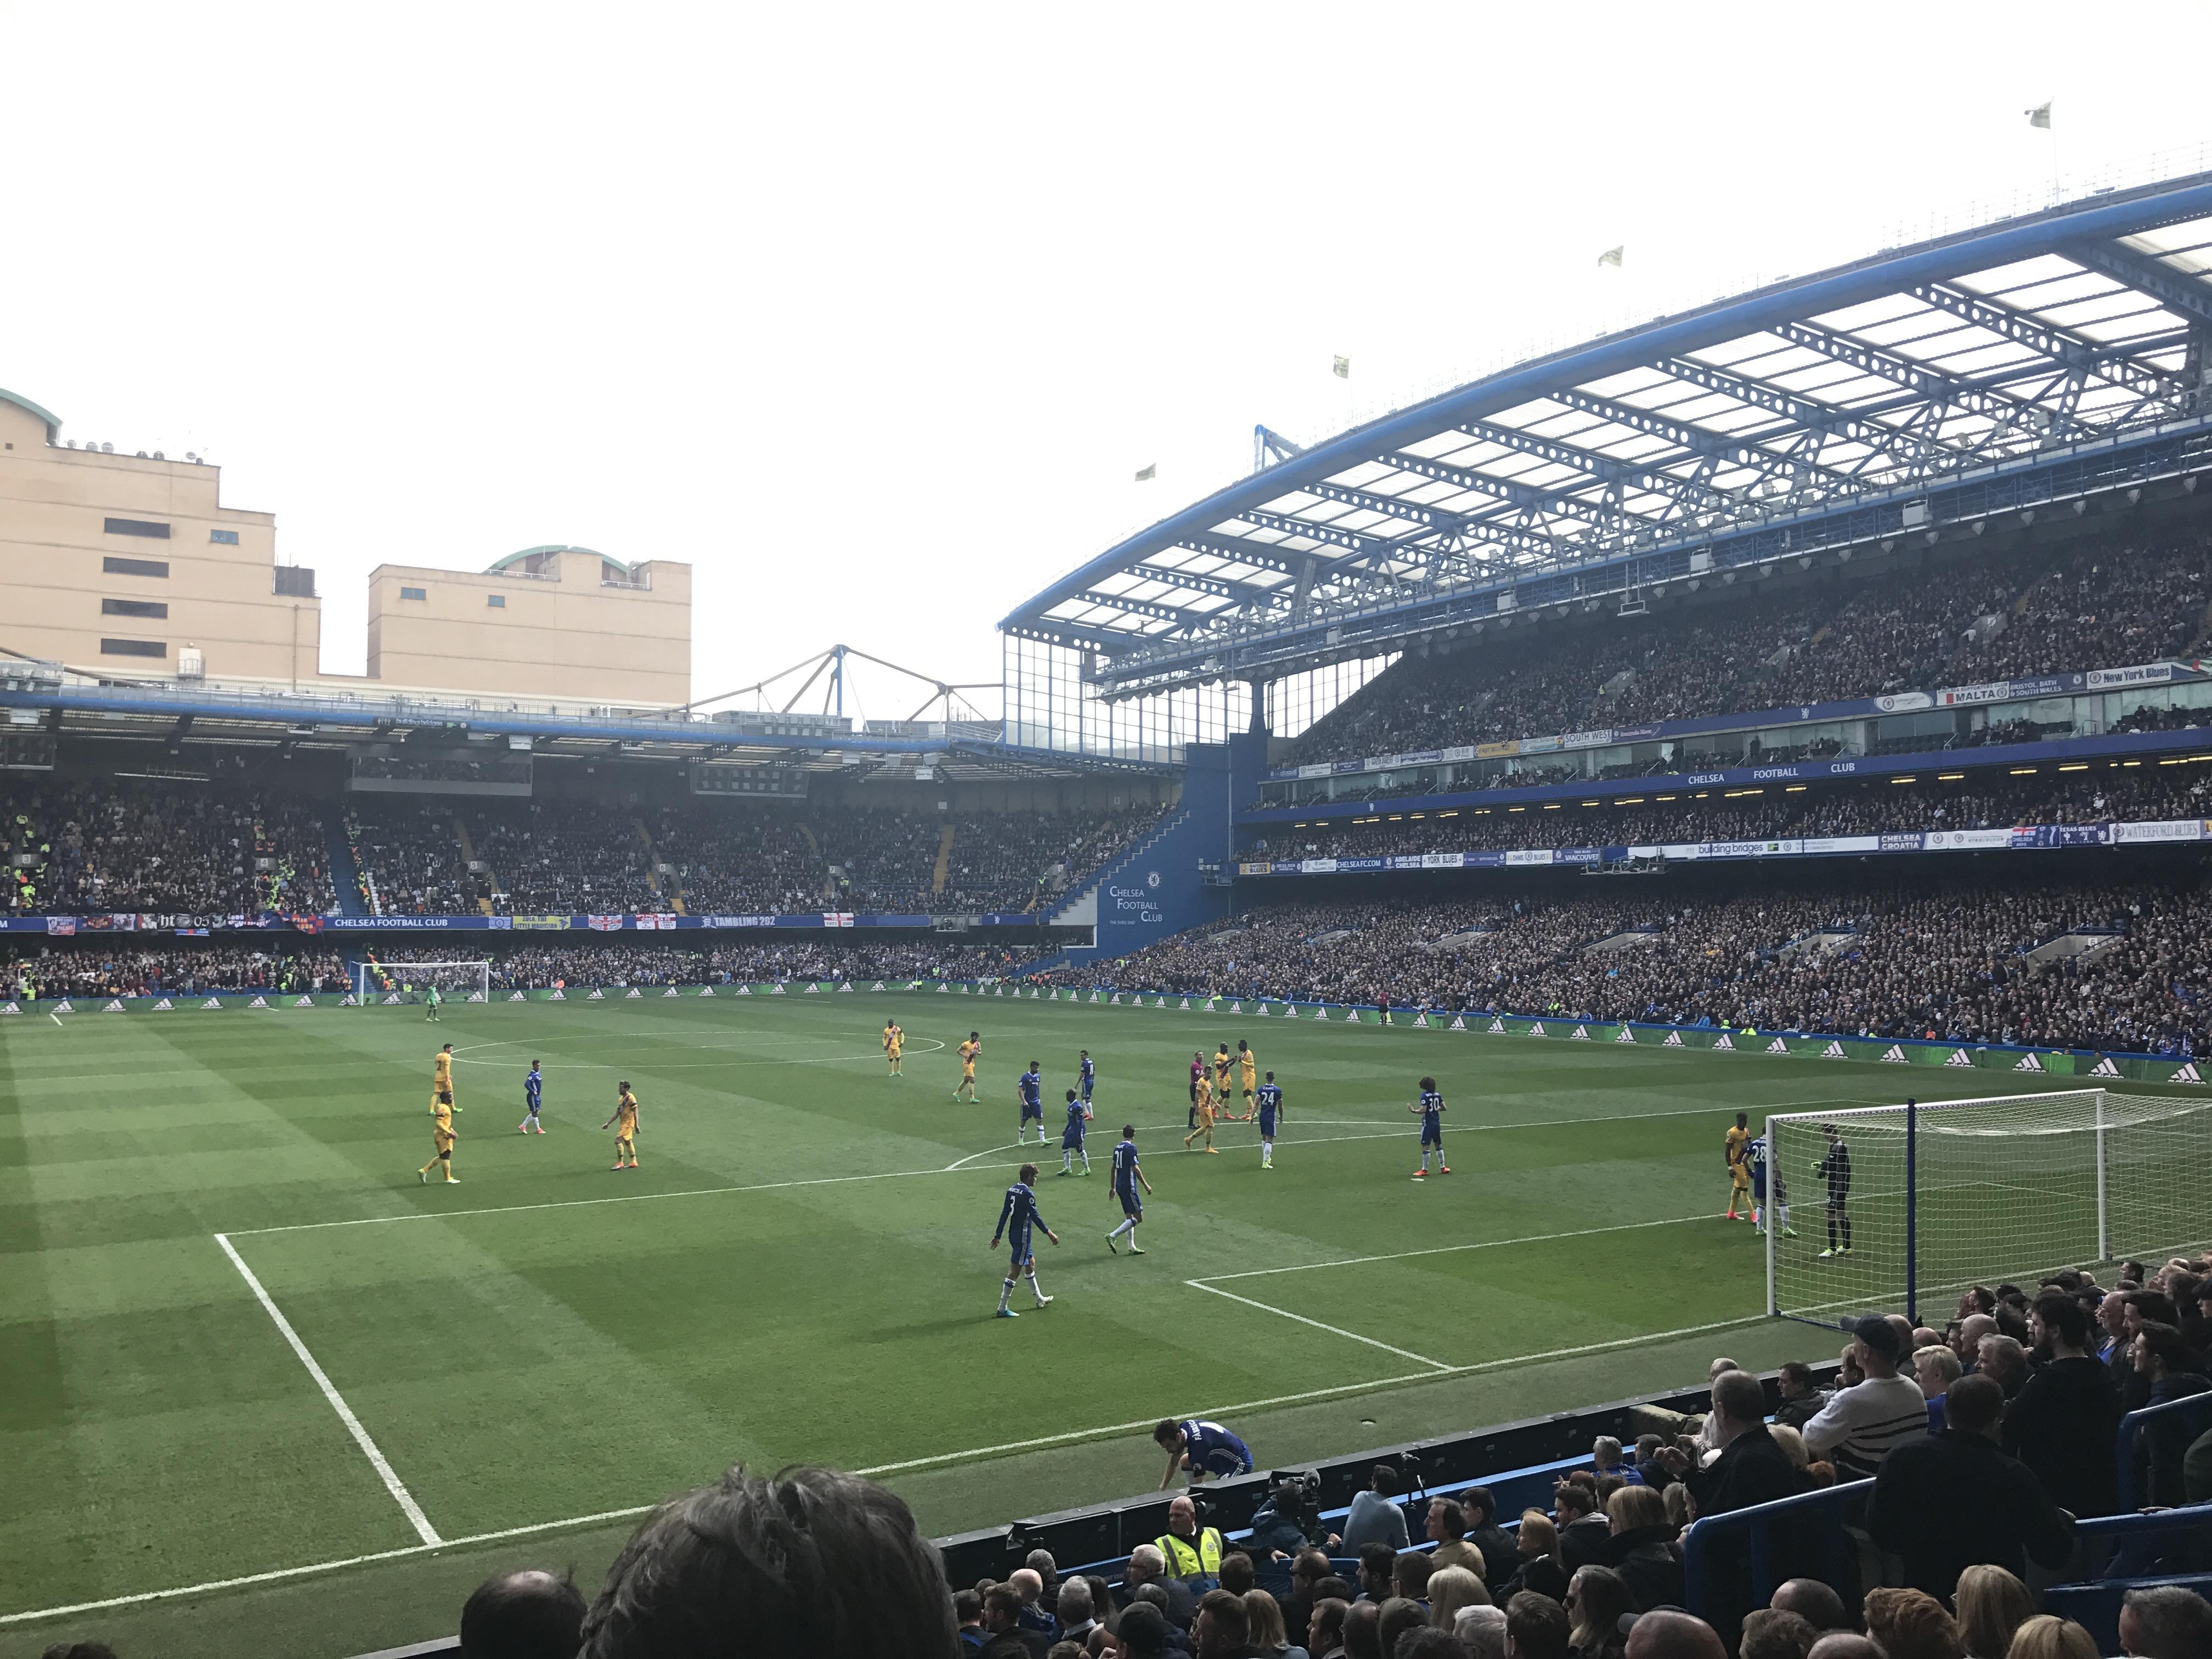 Stamford Bridge Secção Matthew Harding Lower 14 Fila S Lugar 131